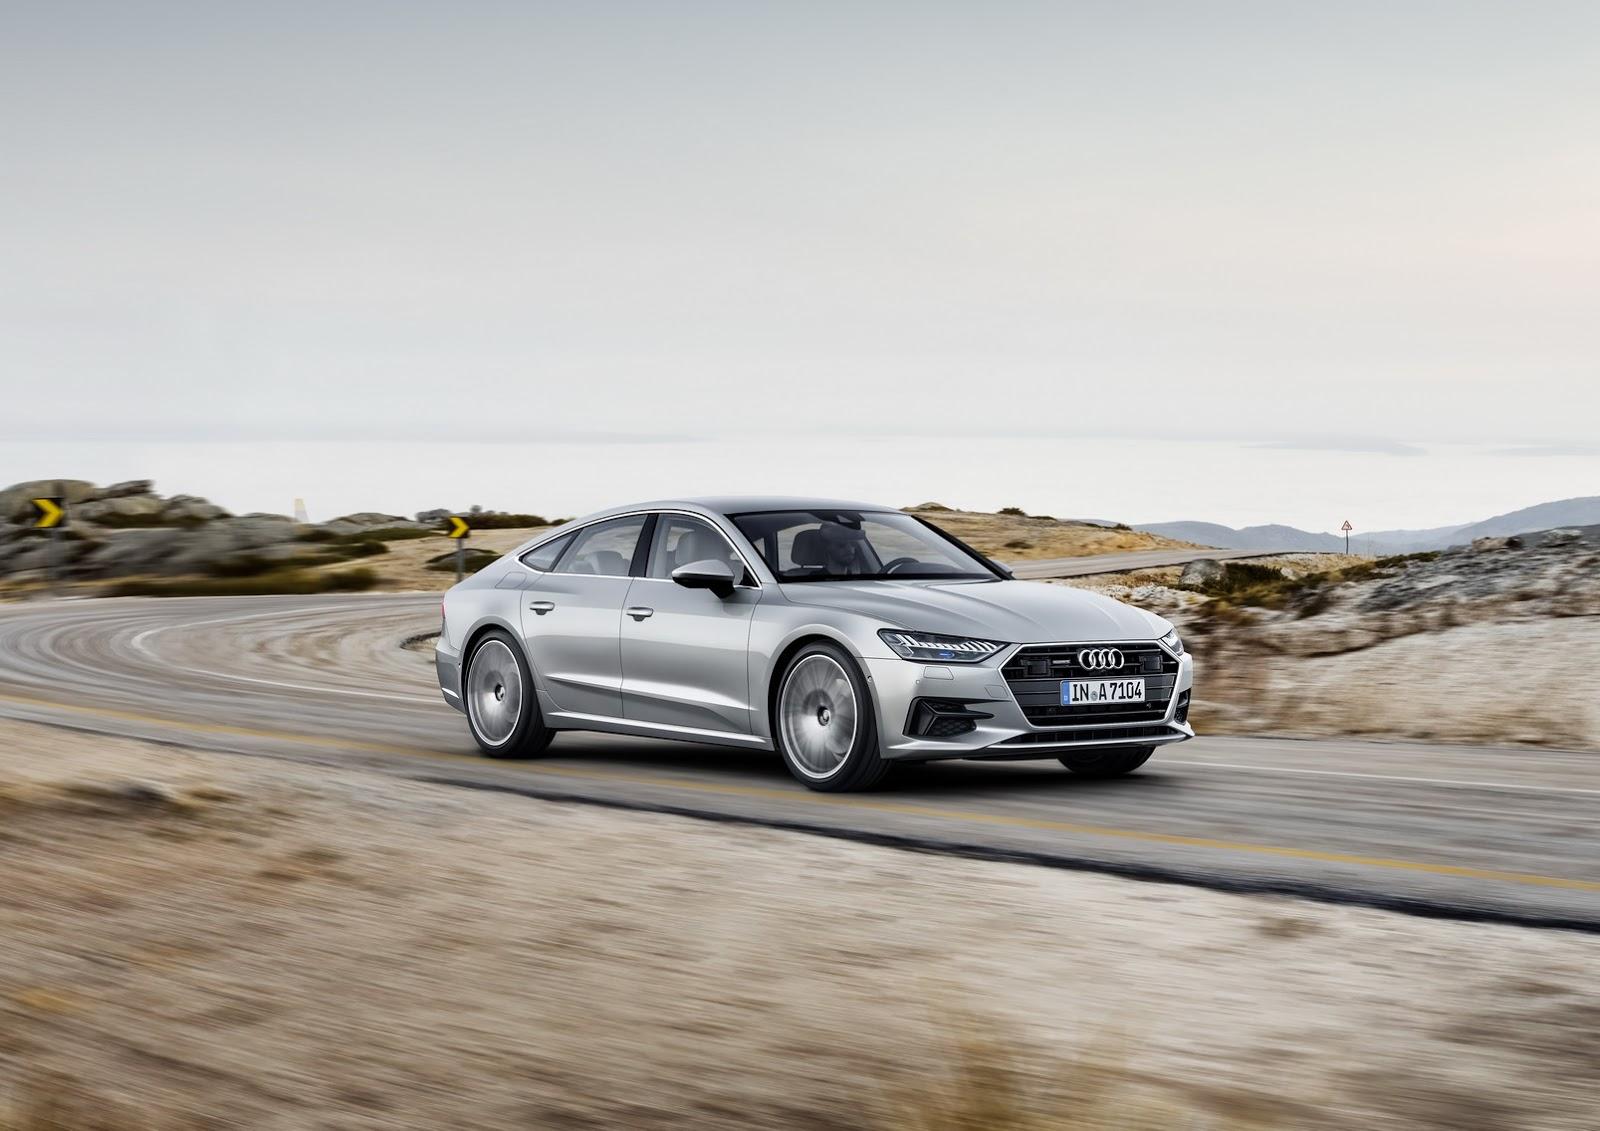 2018_Audi_A7_Sportback_0015